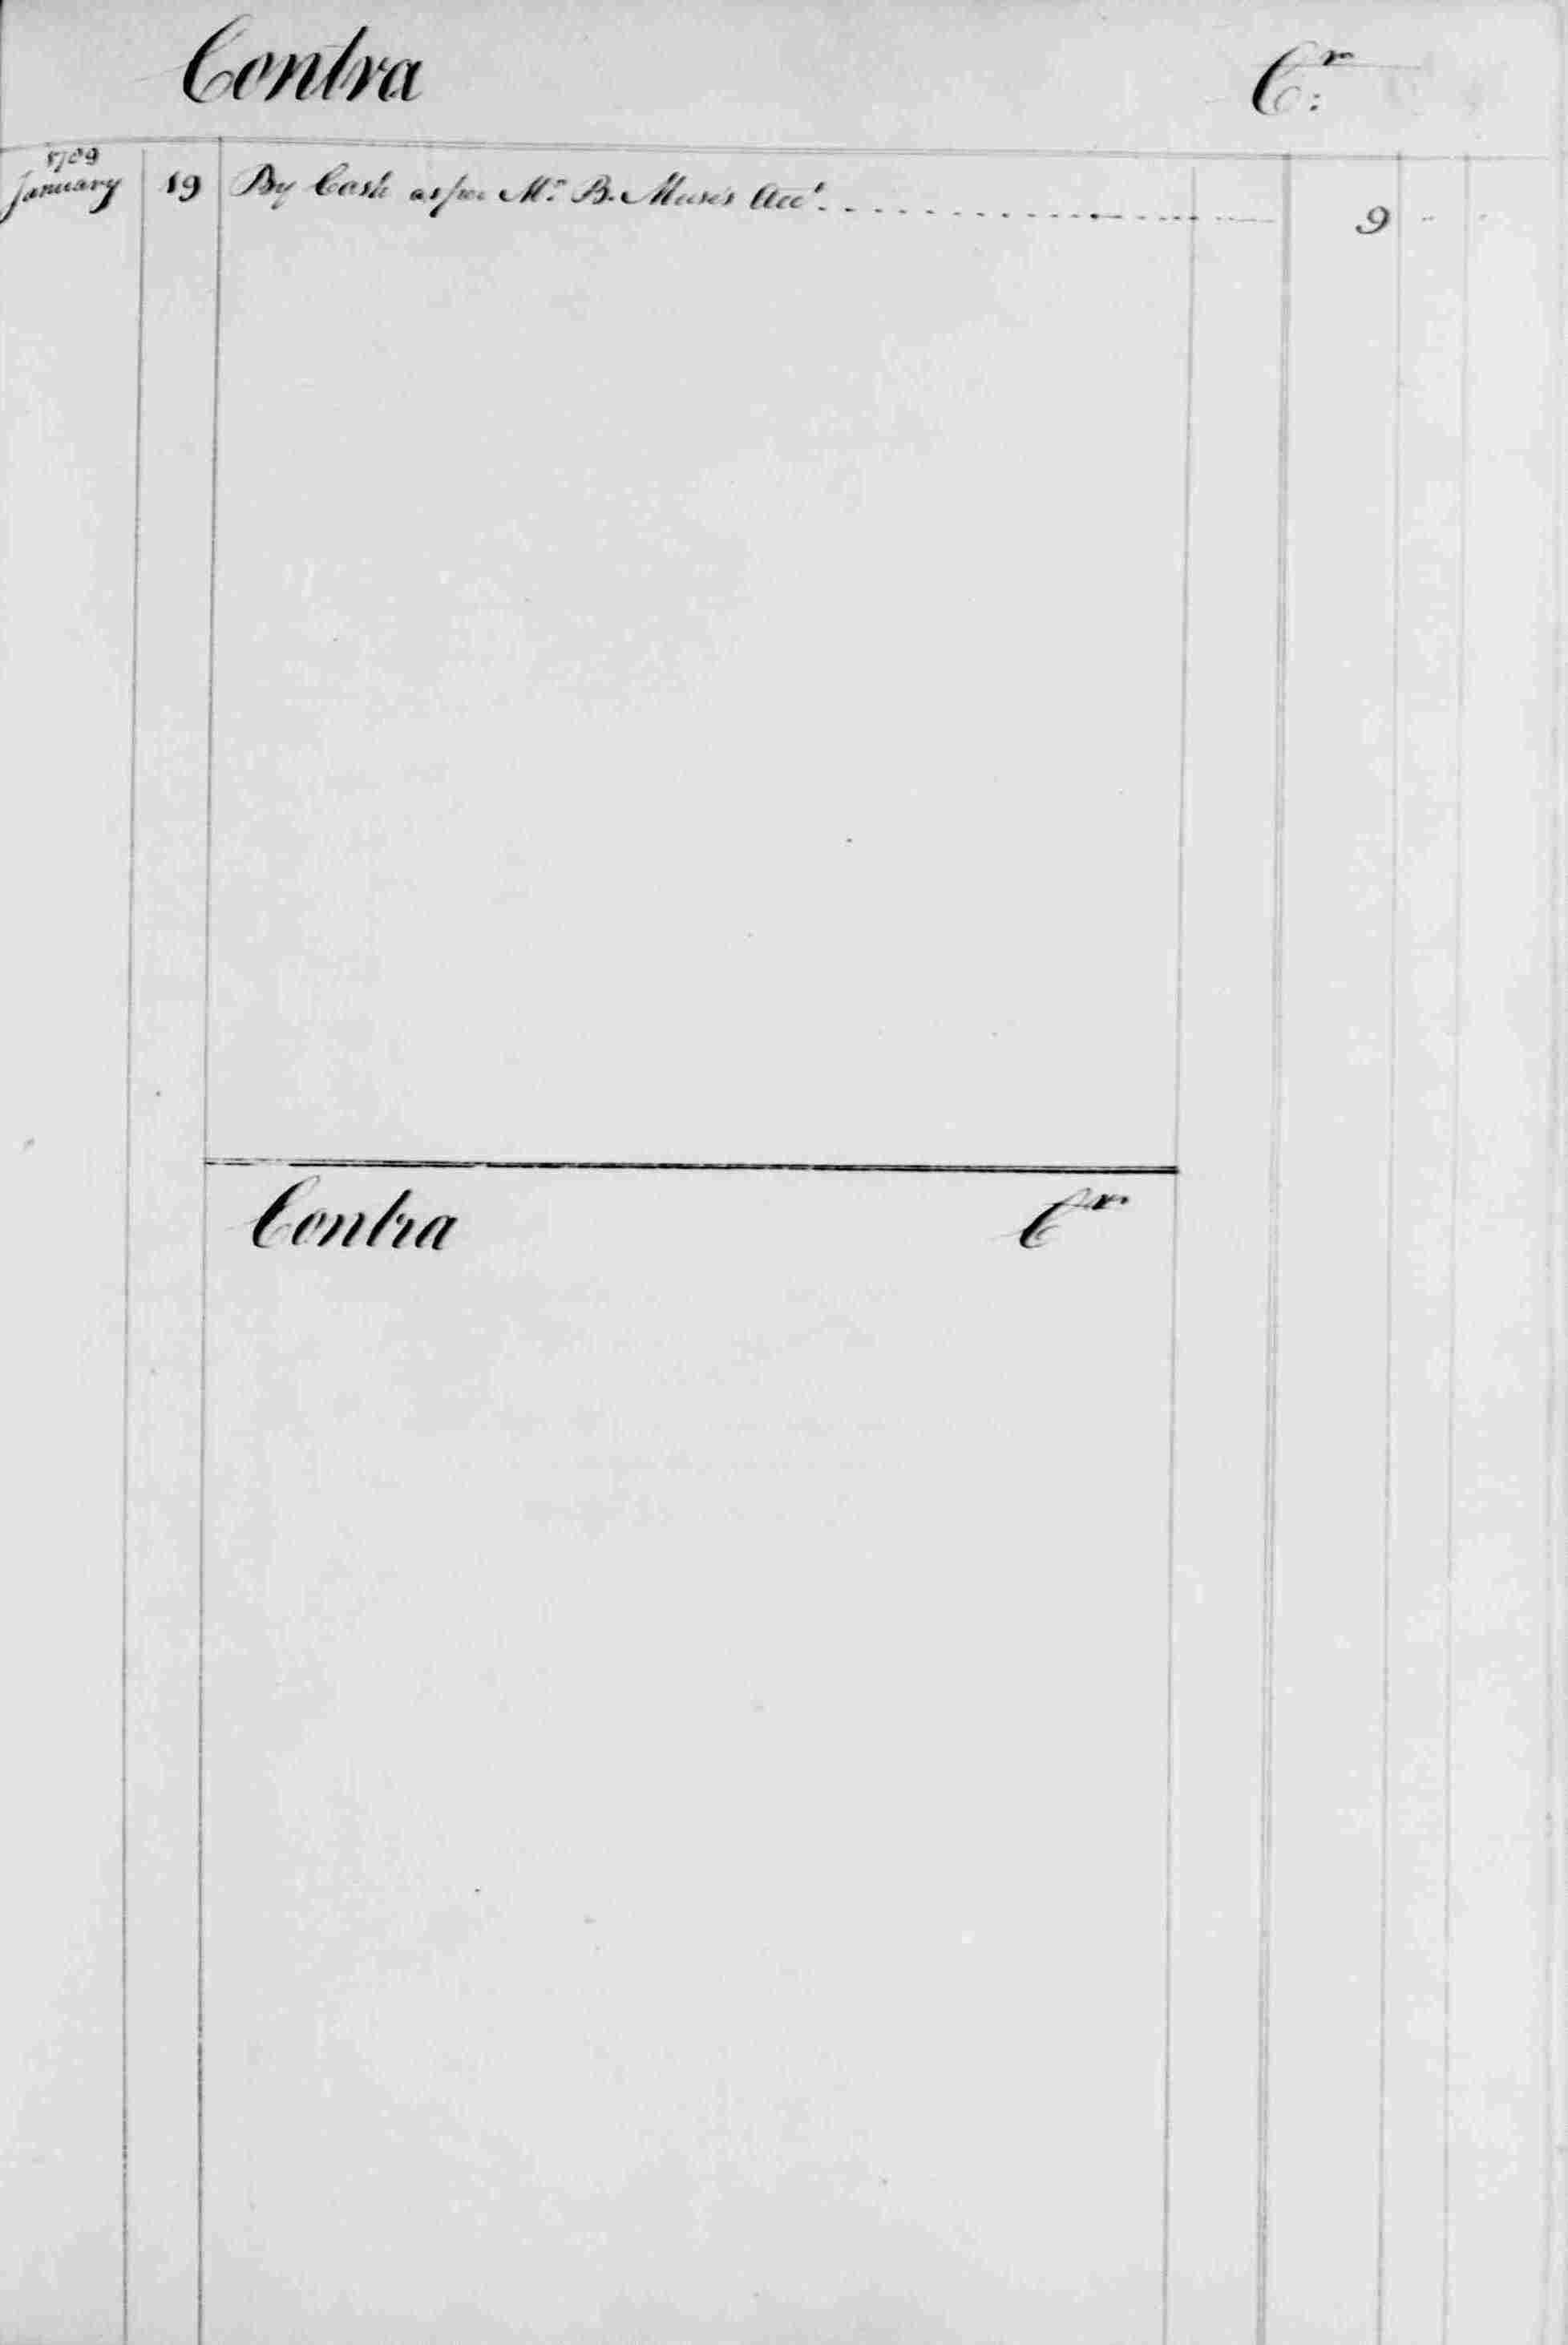 Ledger B, folio 281, right side